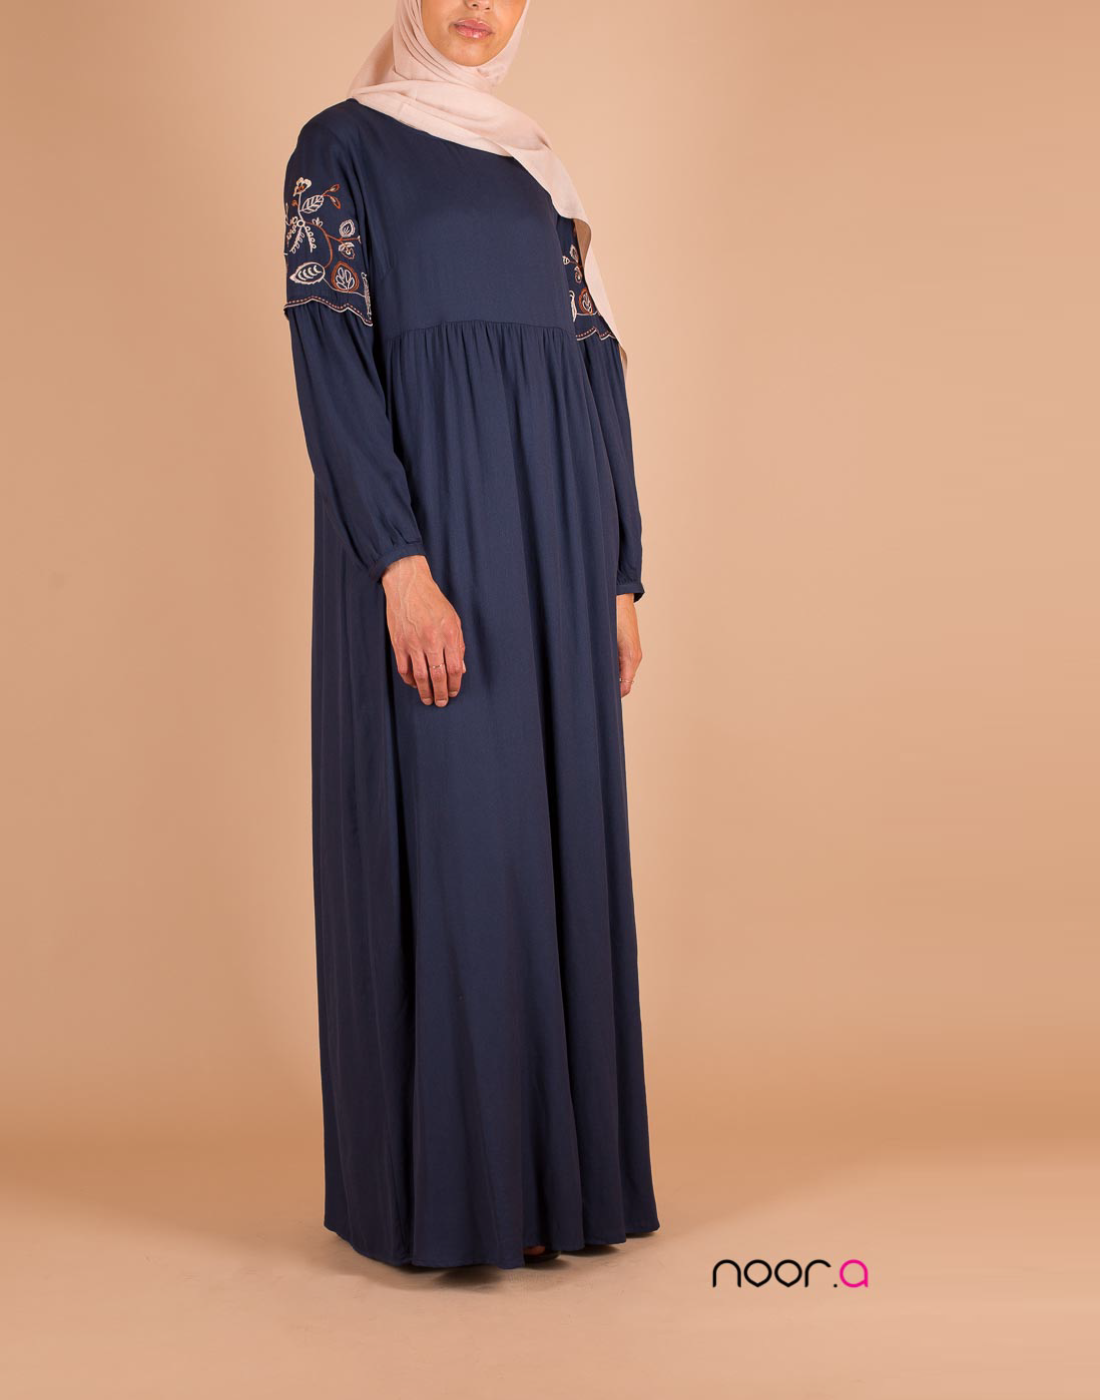 robe_longue_ete_hijab_alma